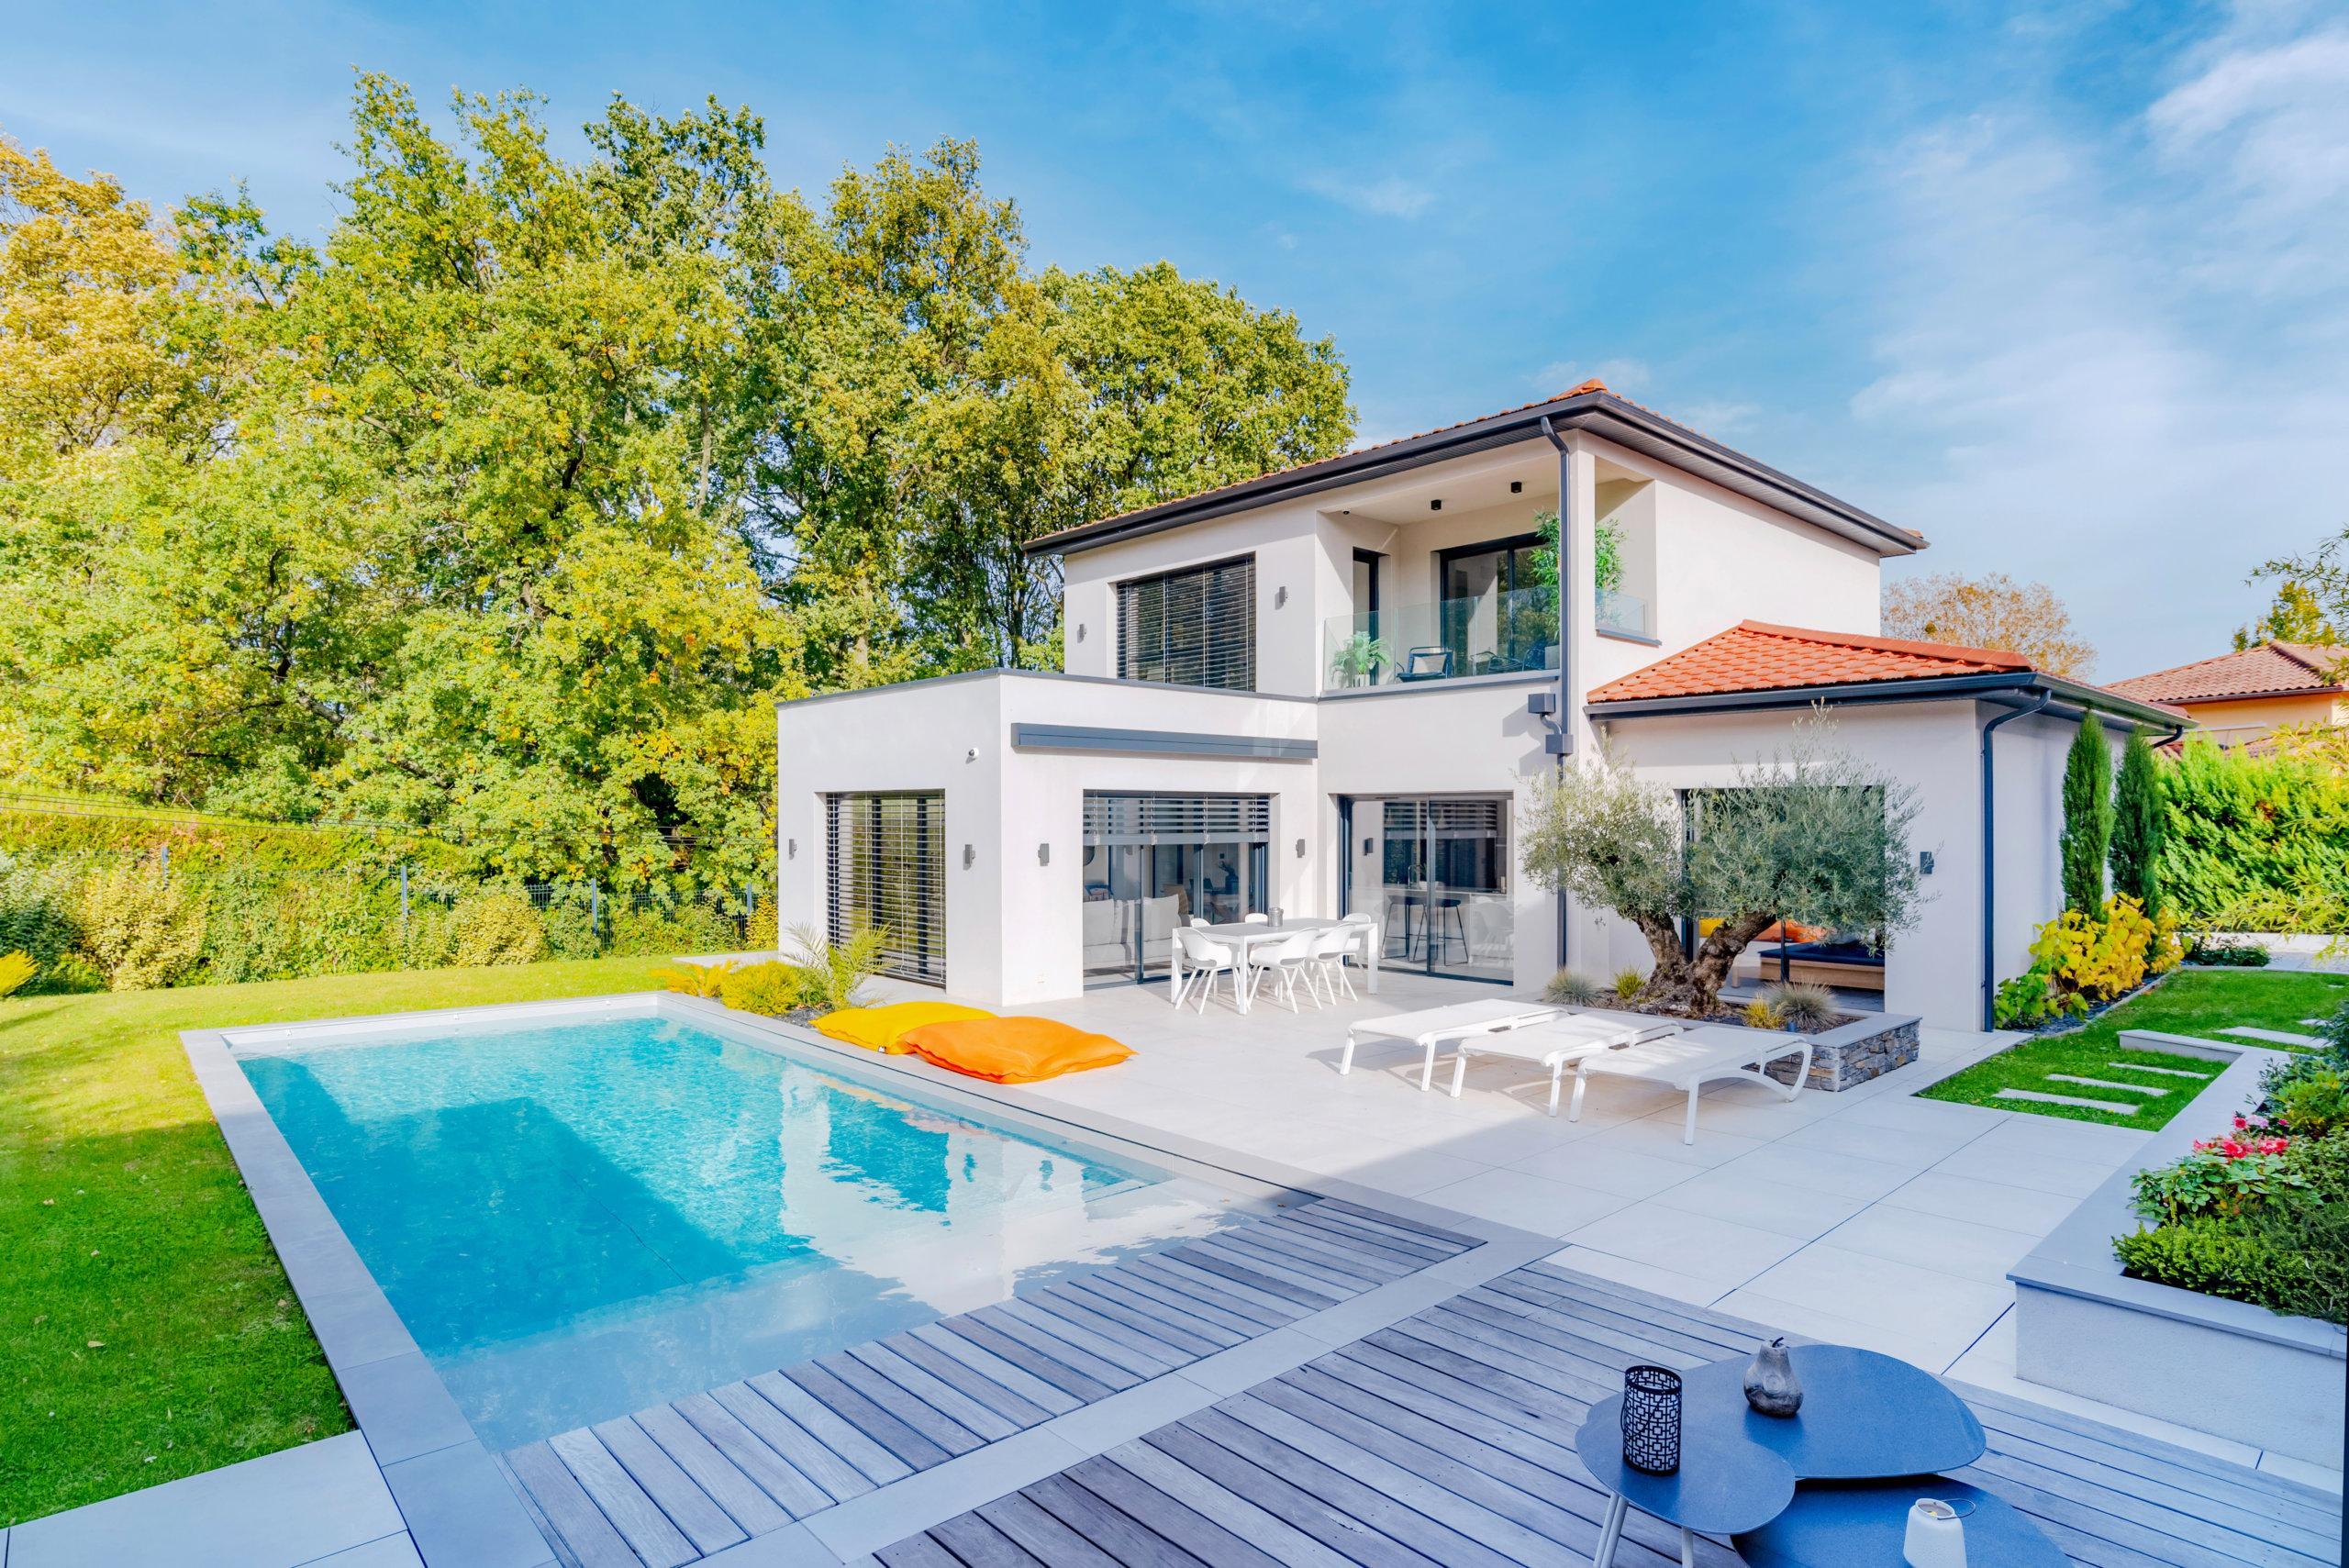 maisons-contemporaines-piscine-jardin